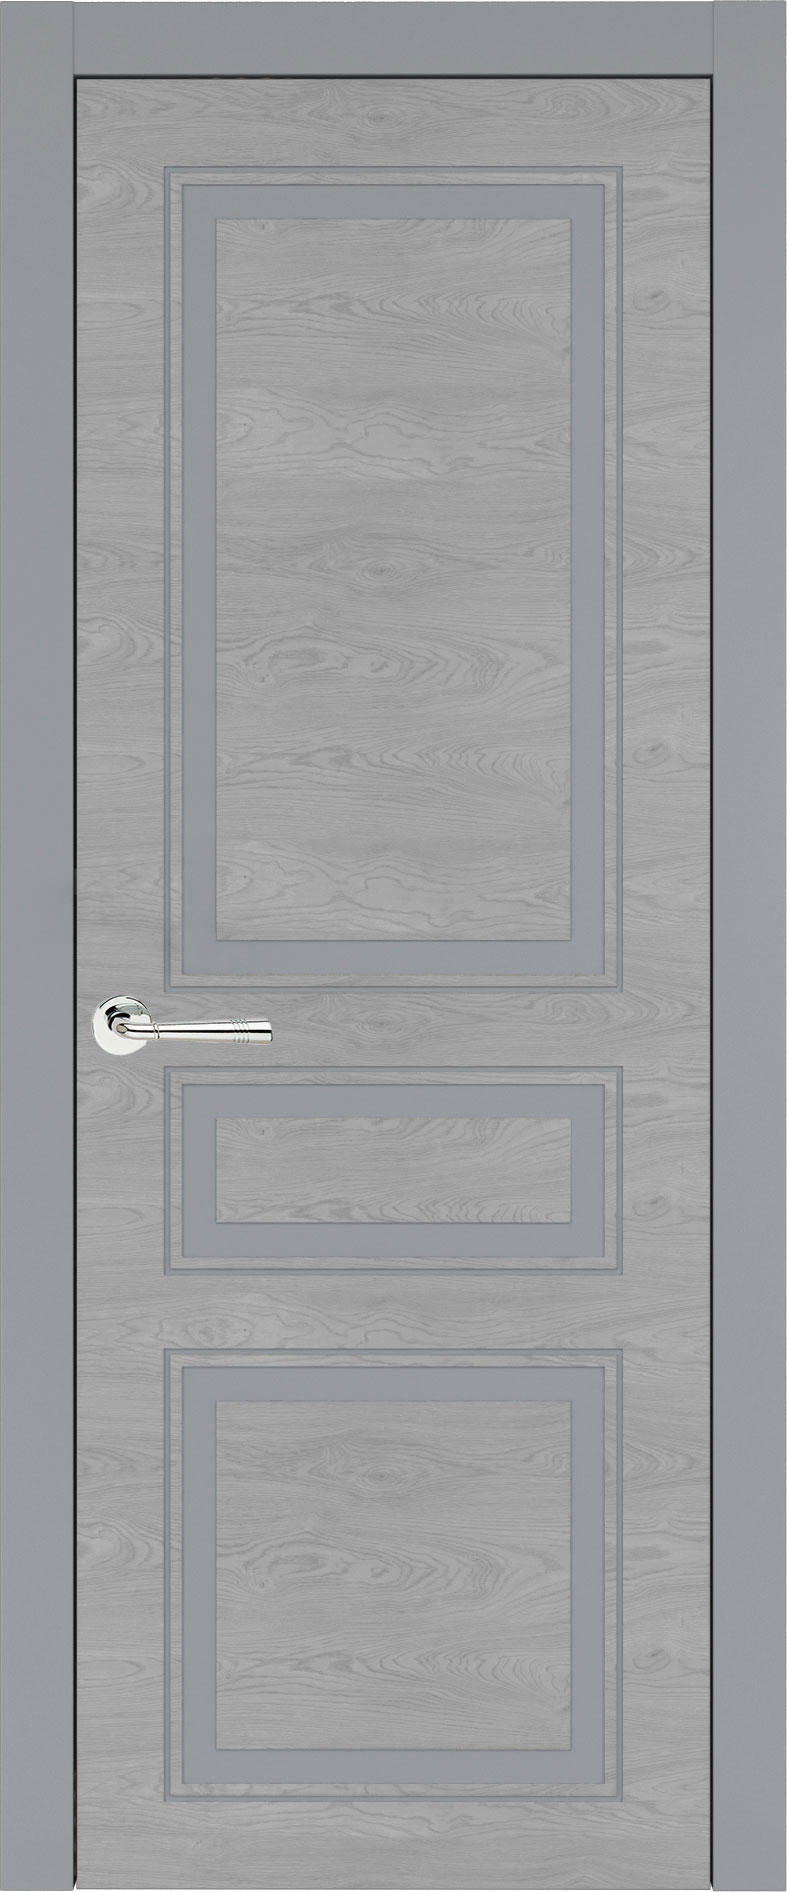 Imperia-R Neo Classic цвет - Серебристо-серая эмаль по шпону (RAL 7045) Без стекла (ДГ)